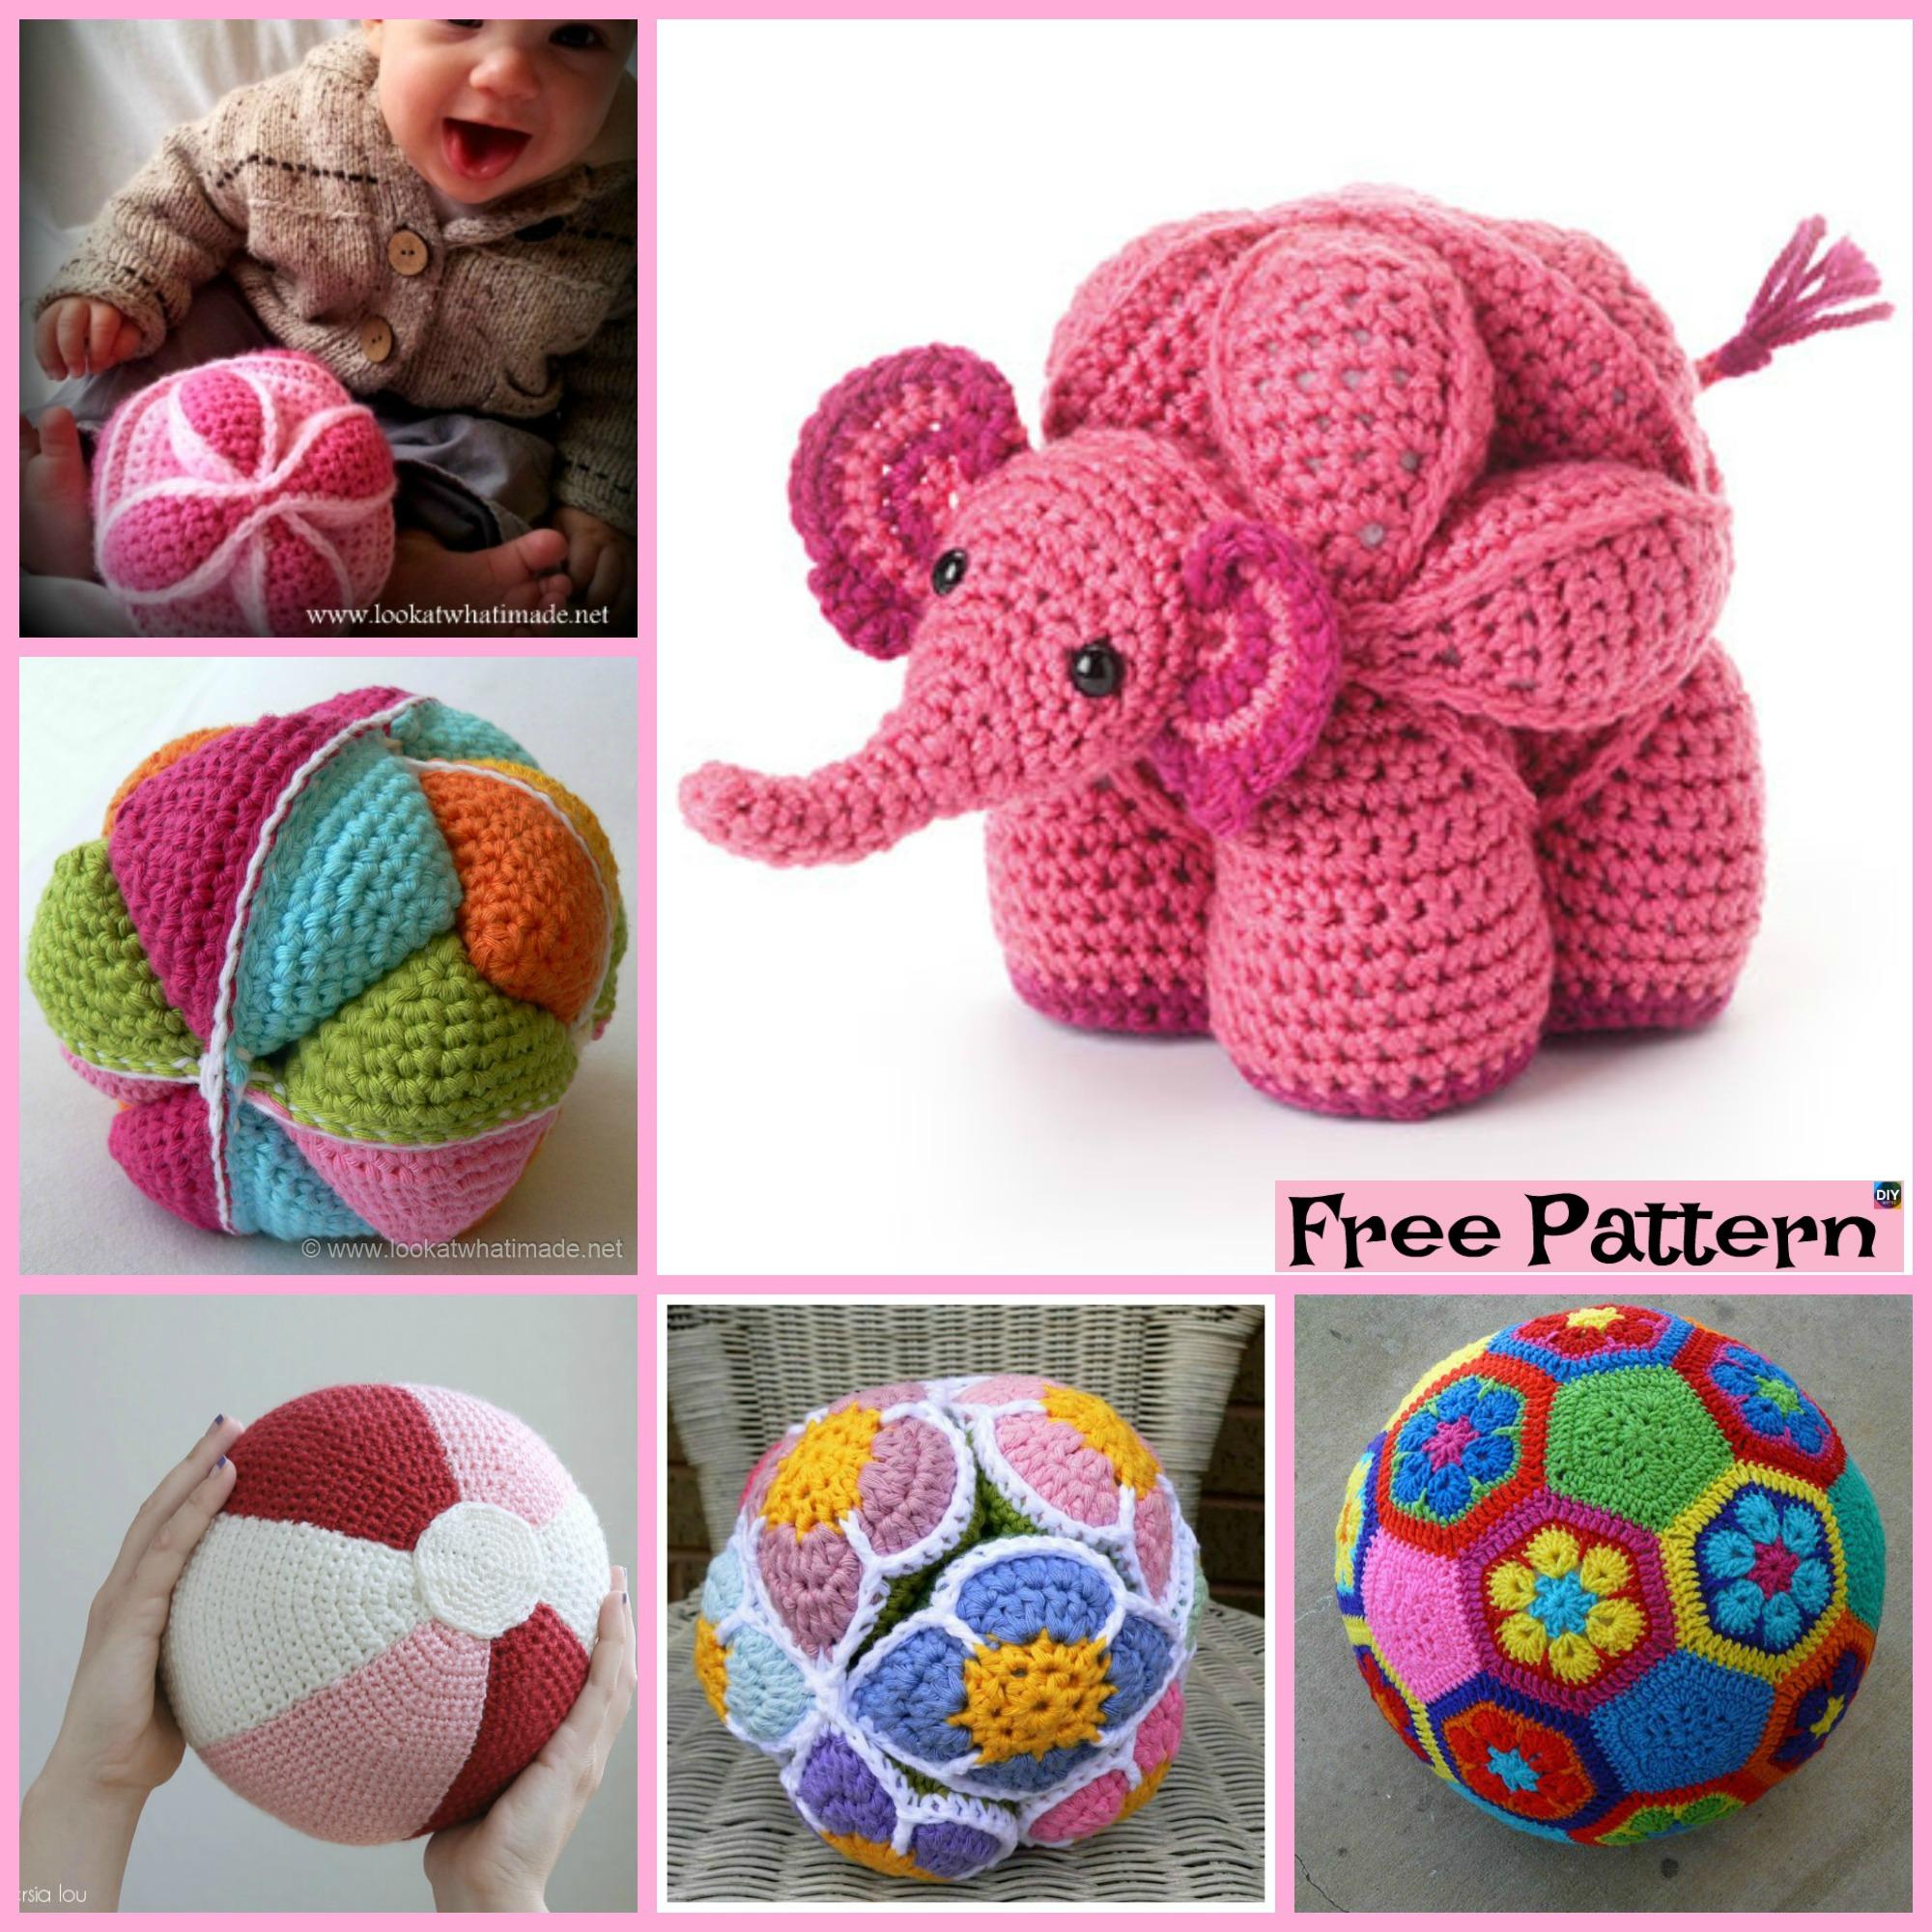 diy4ever-10 Cute Crochet Balls - Free Patterns